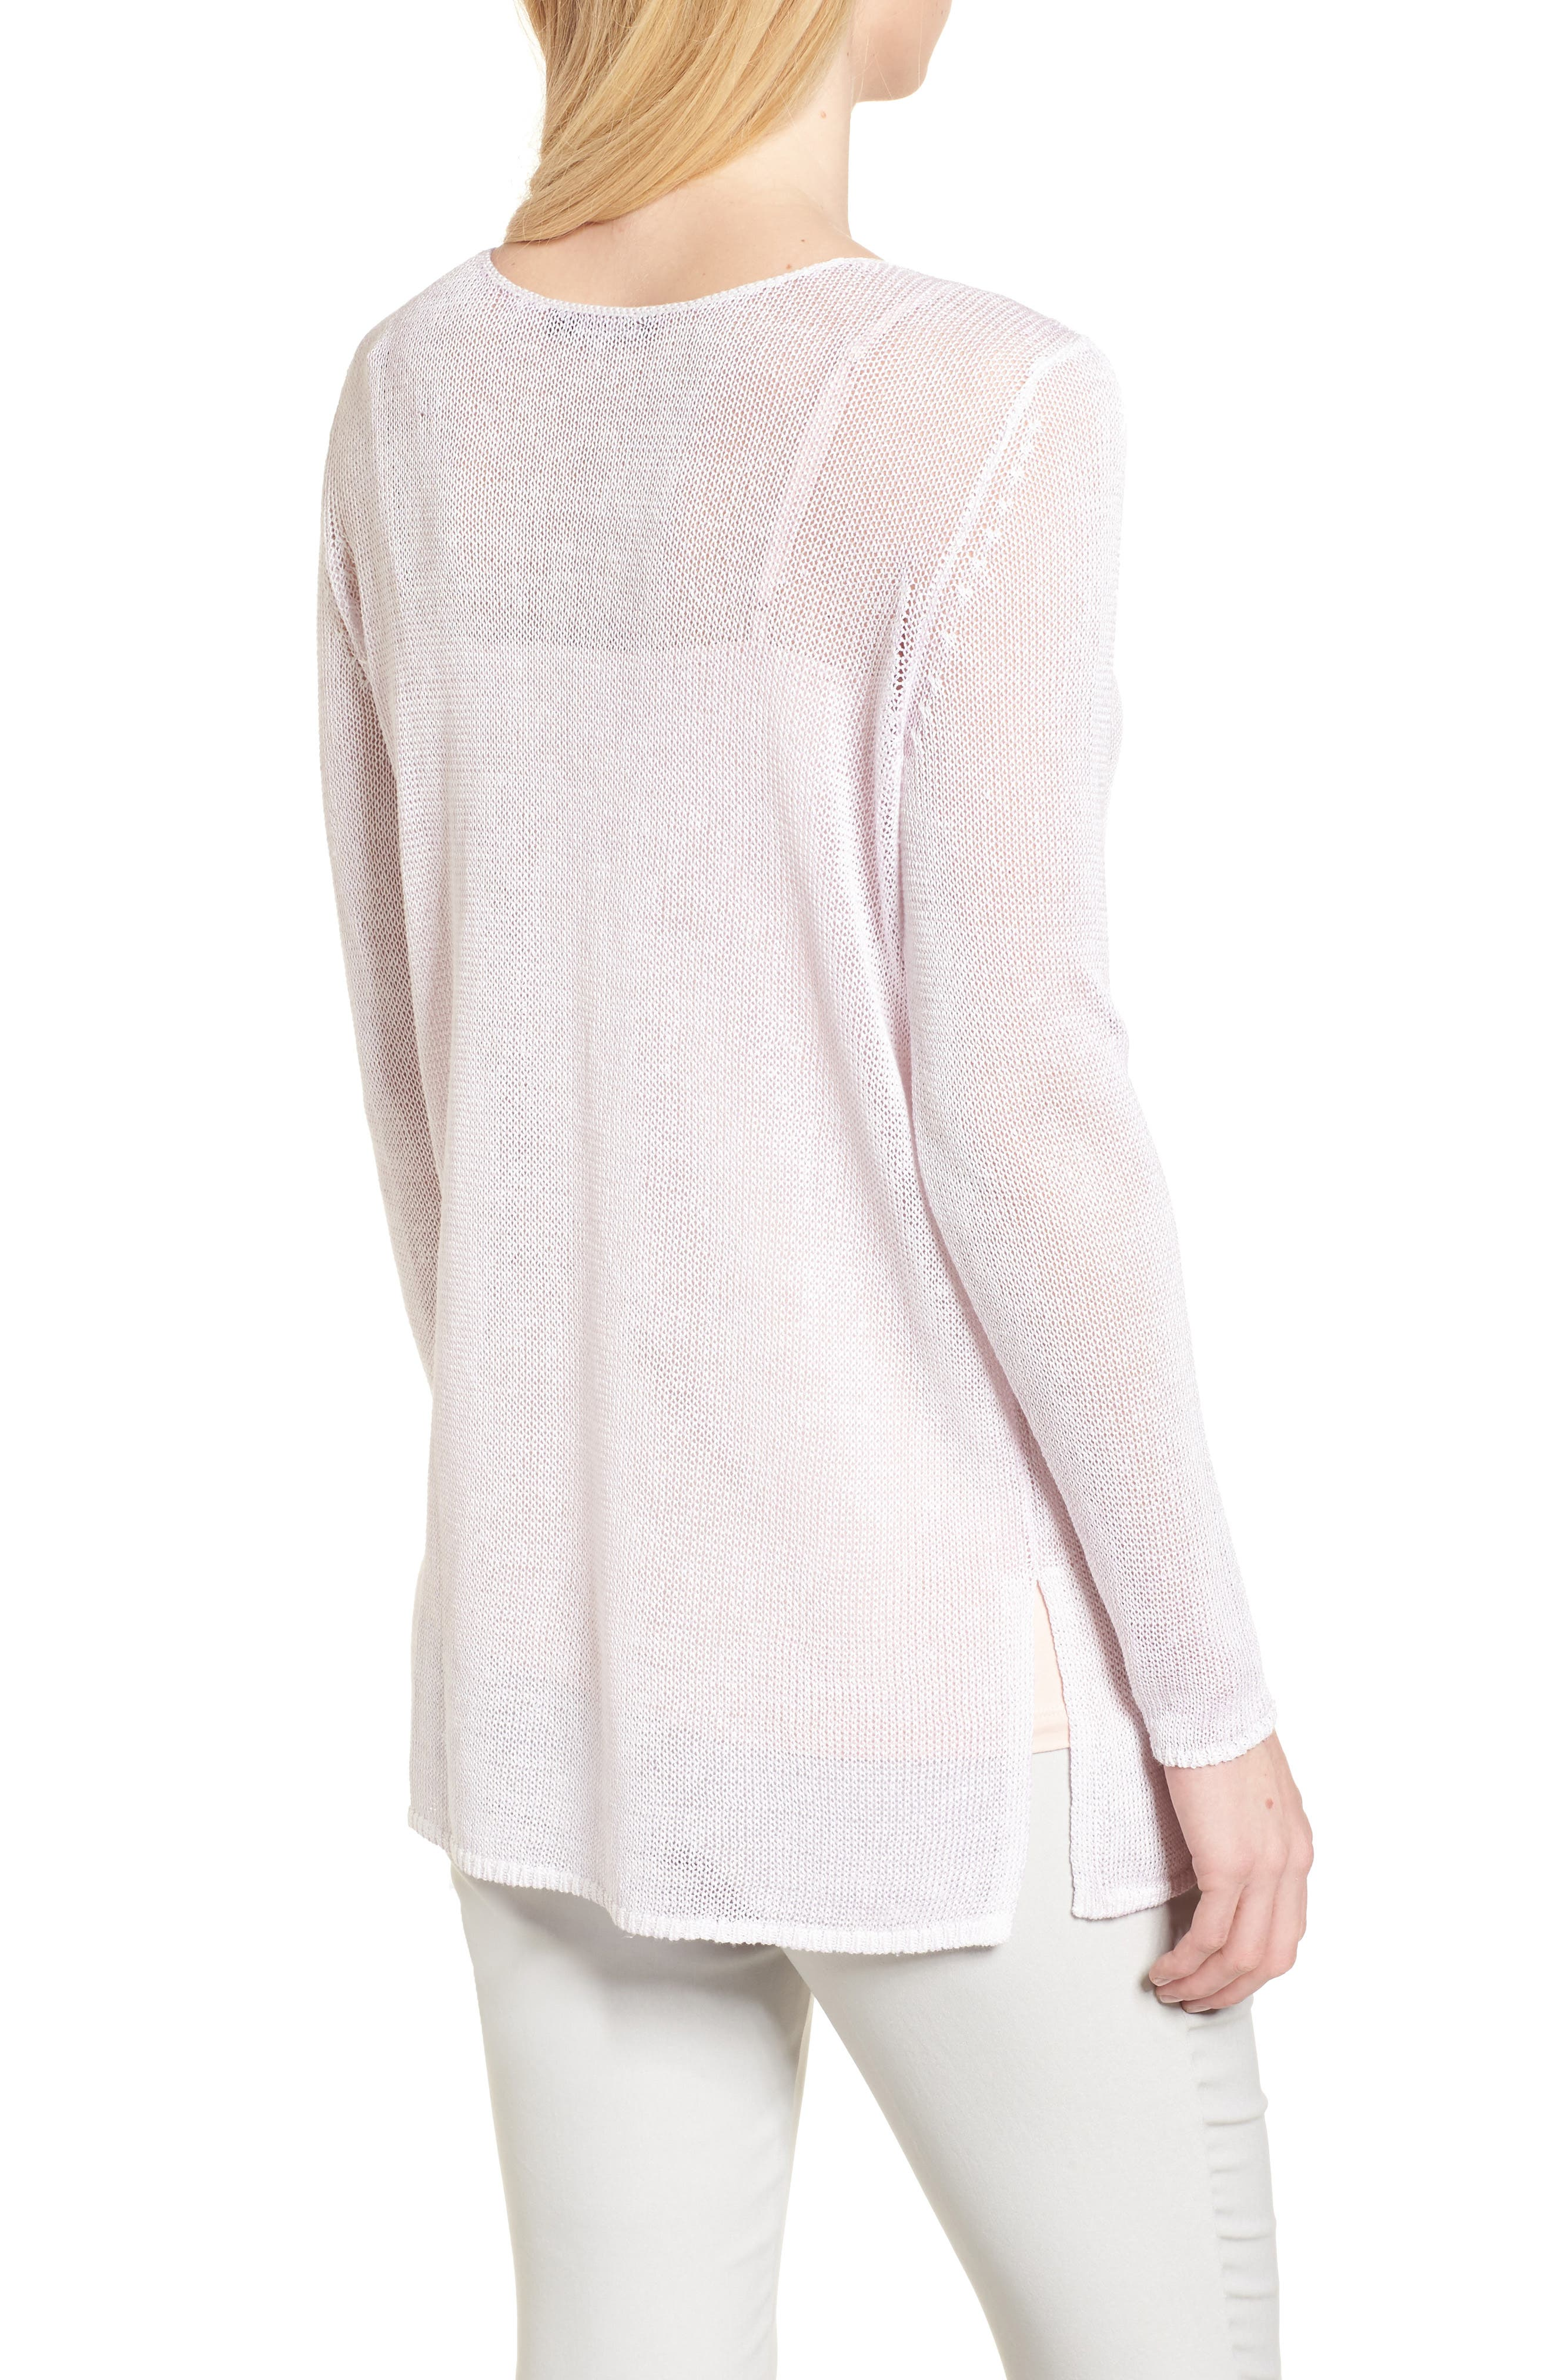 NIC + ZOE Poolside Linen Blend Sweater,                             Alternate thumbnail 8, color,